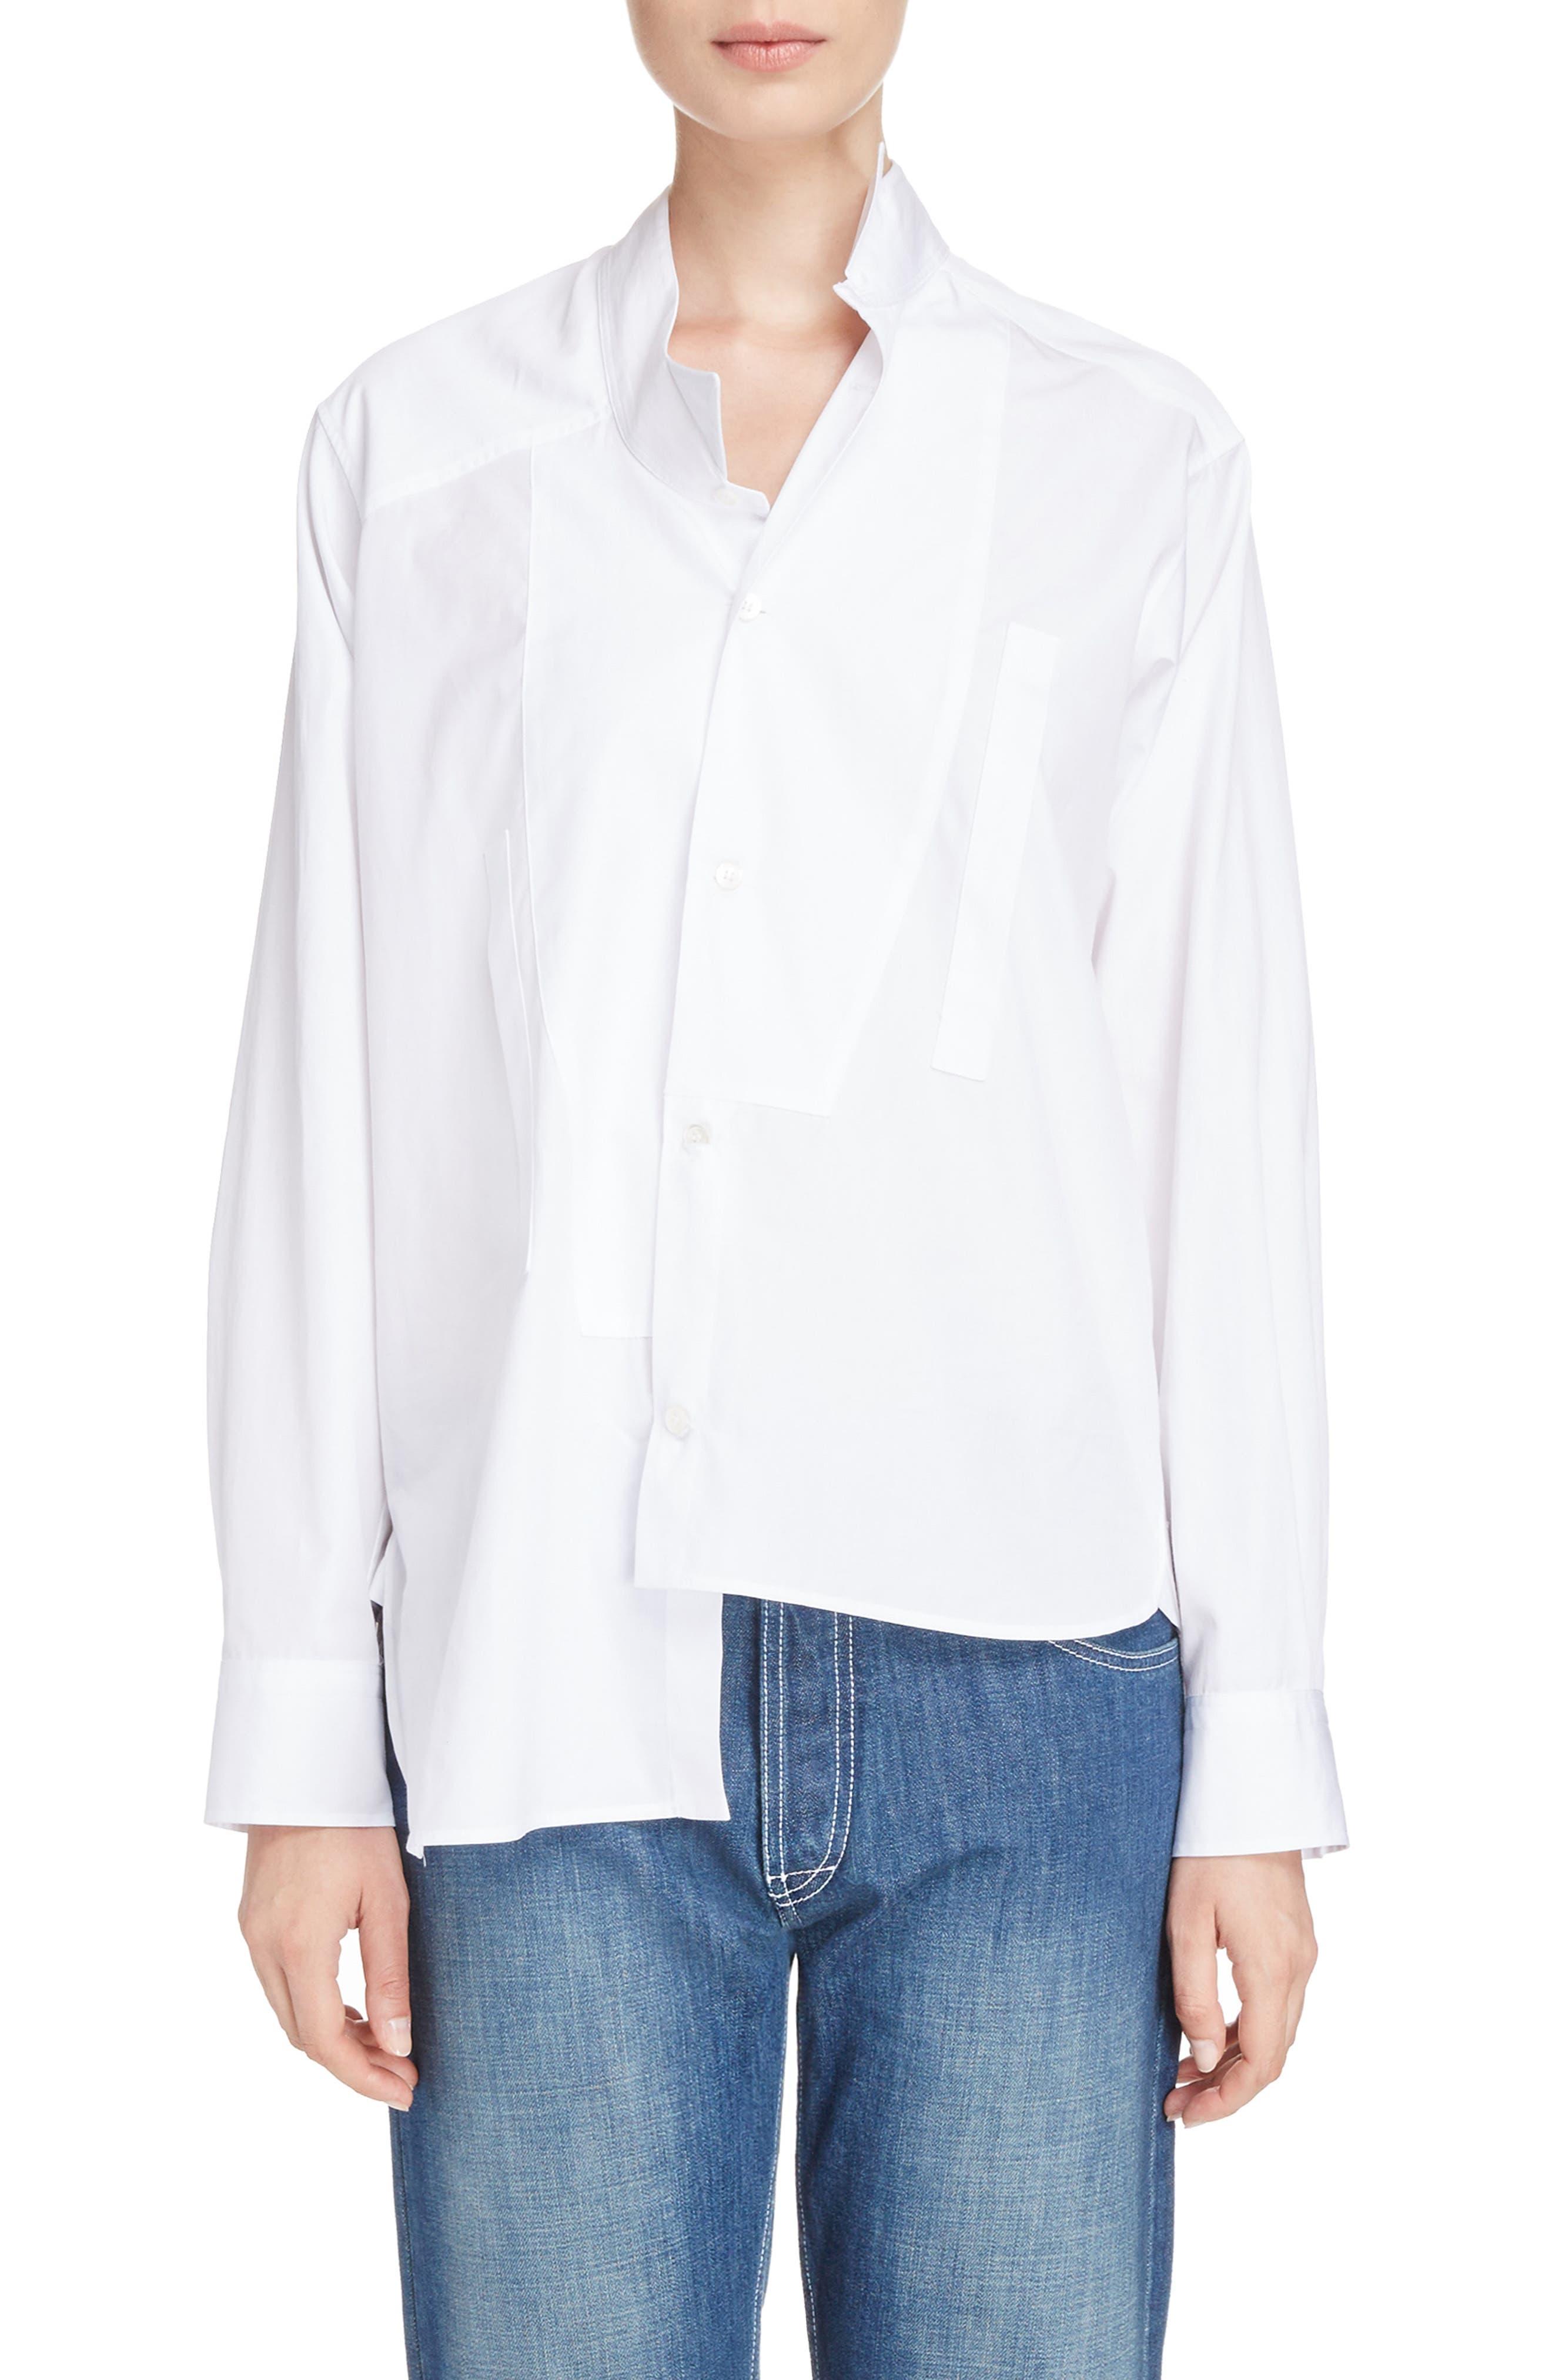 Main Image - Loewe Cotton Poplin Patchwork Shirt